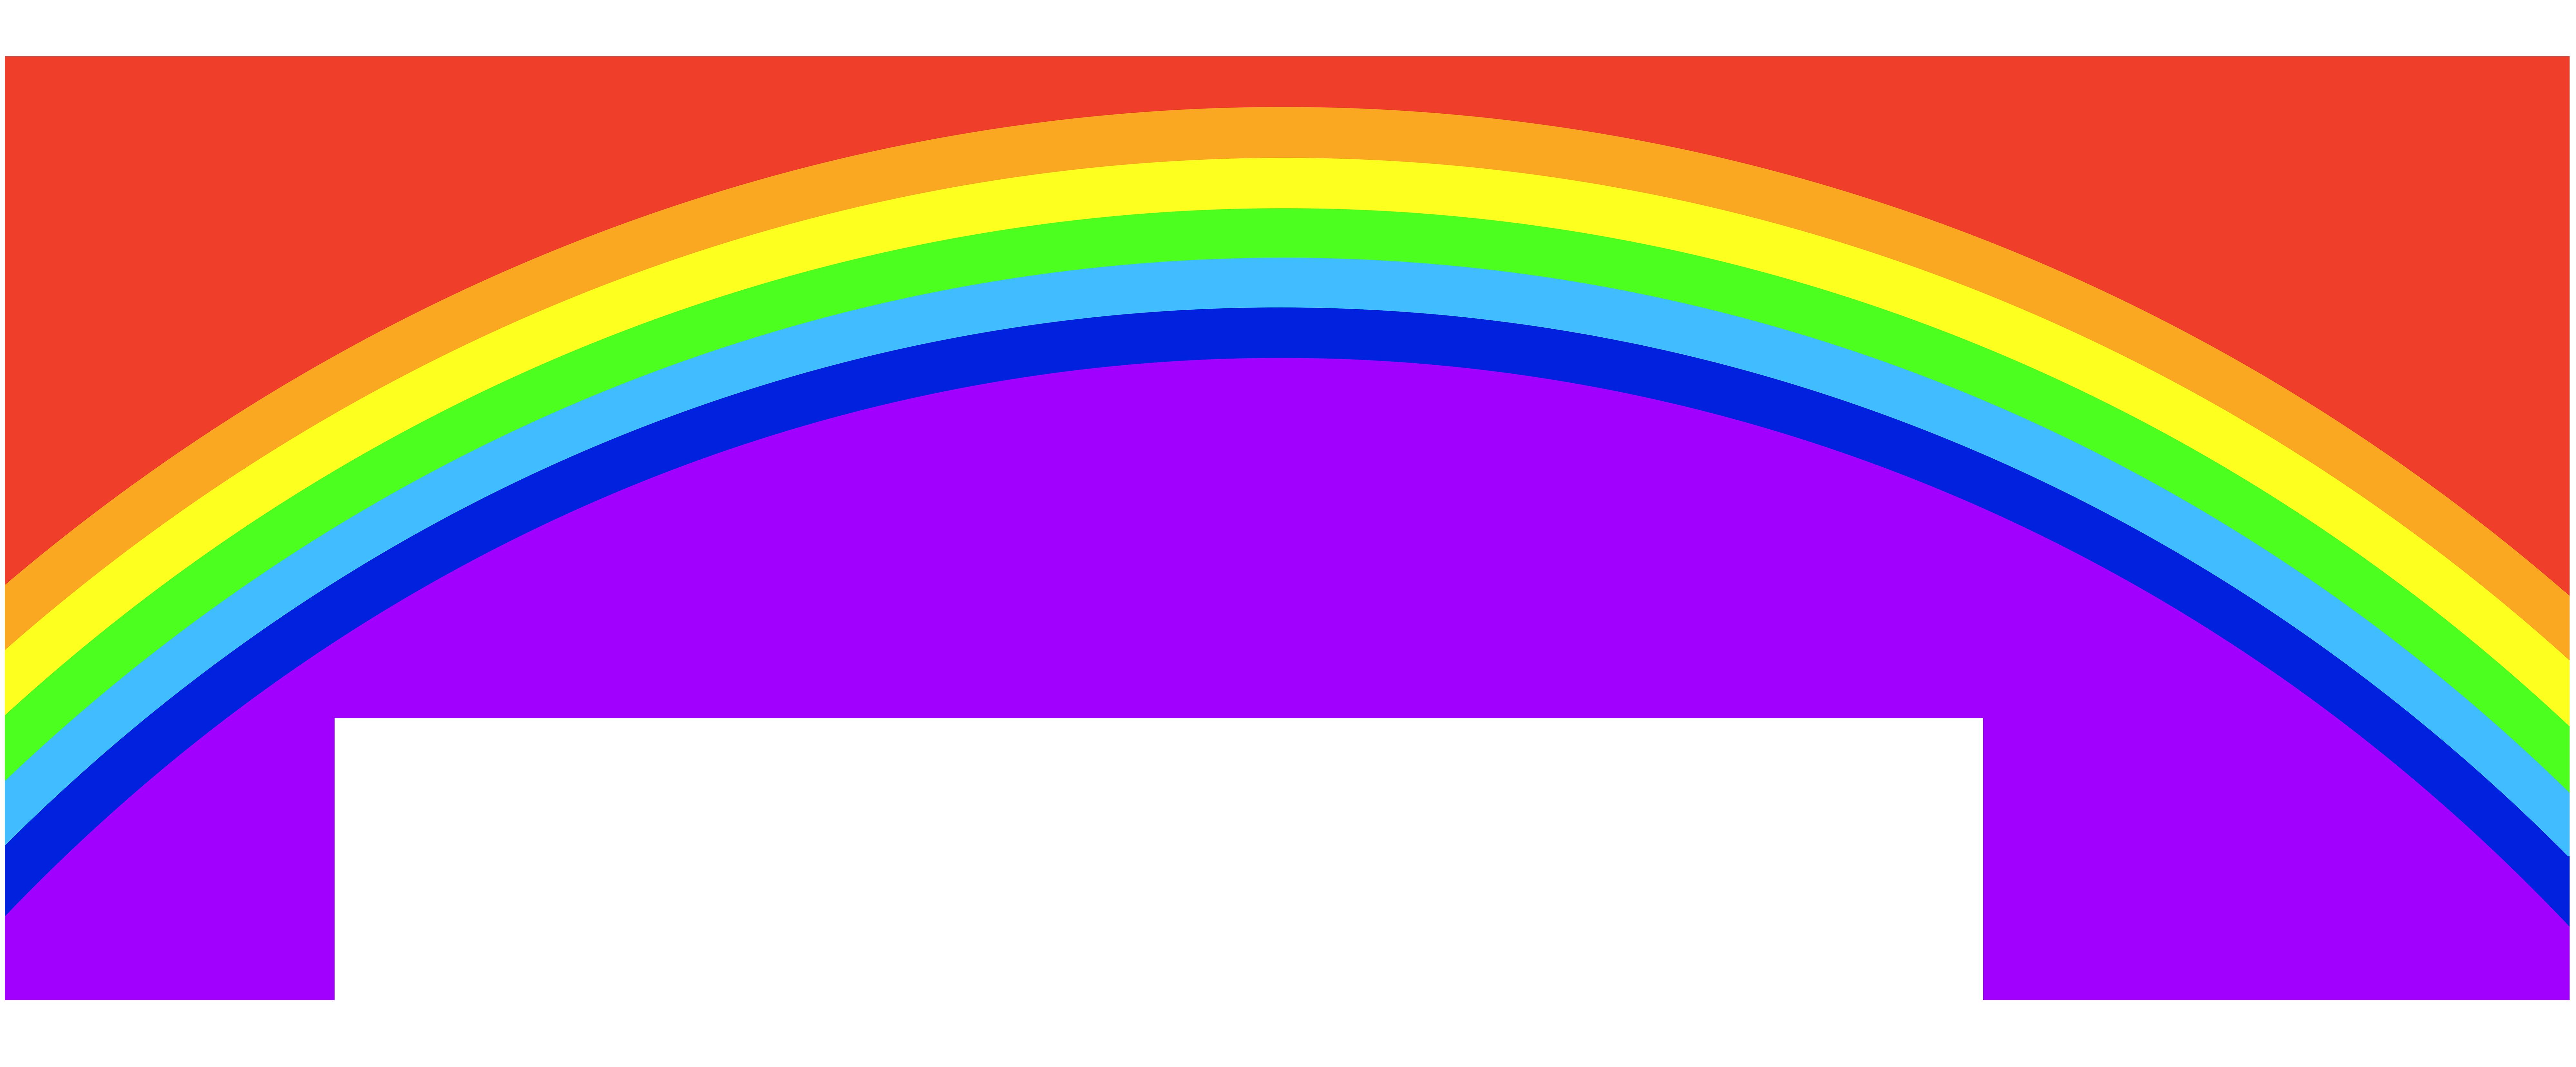 Free Pastel Rainbow Transparent, Download Free Clip Art.